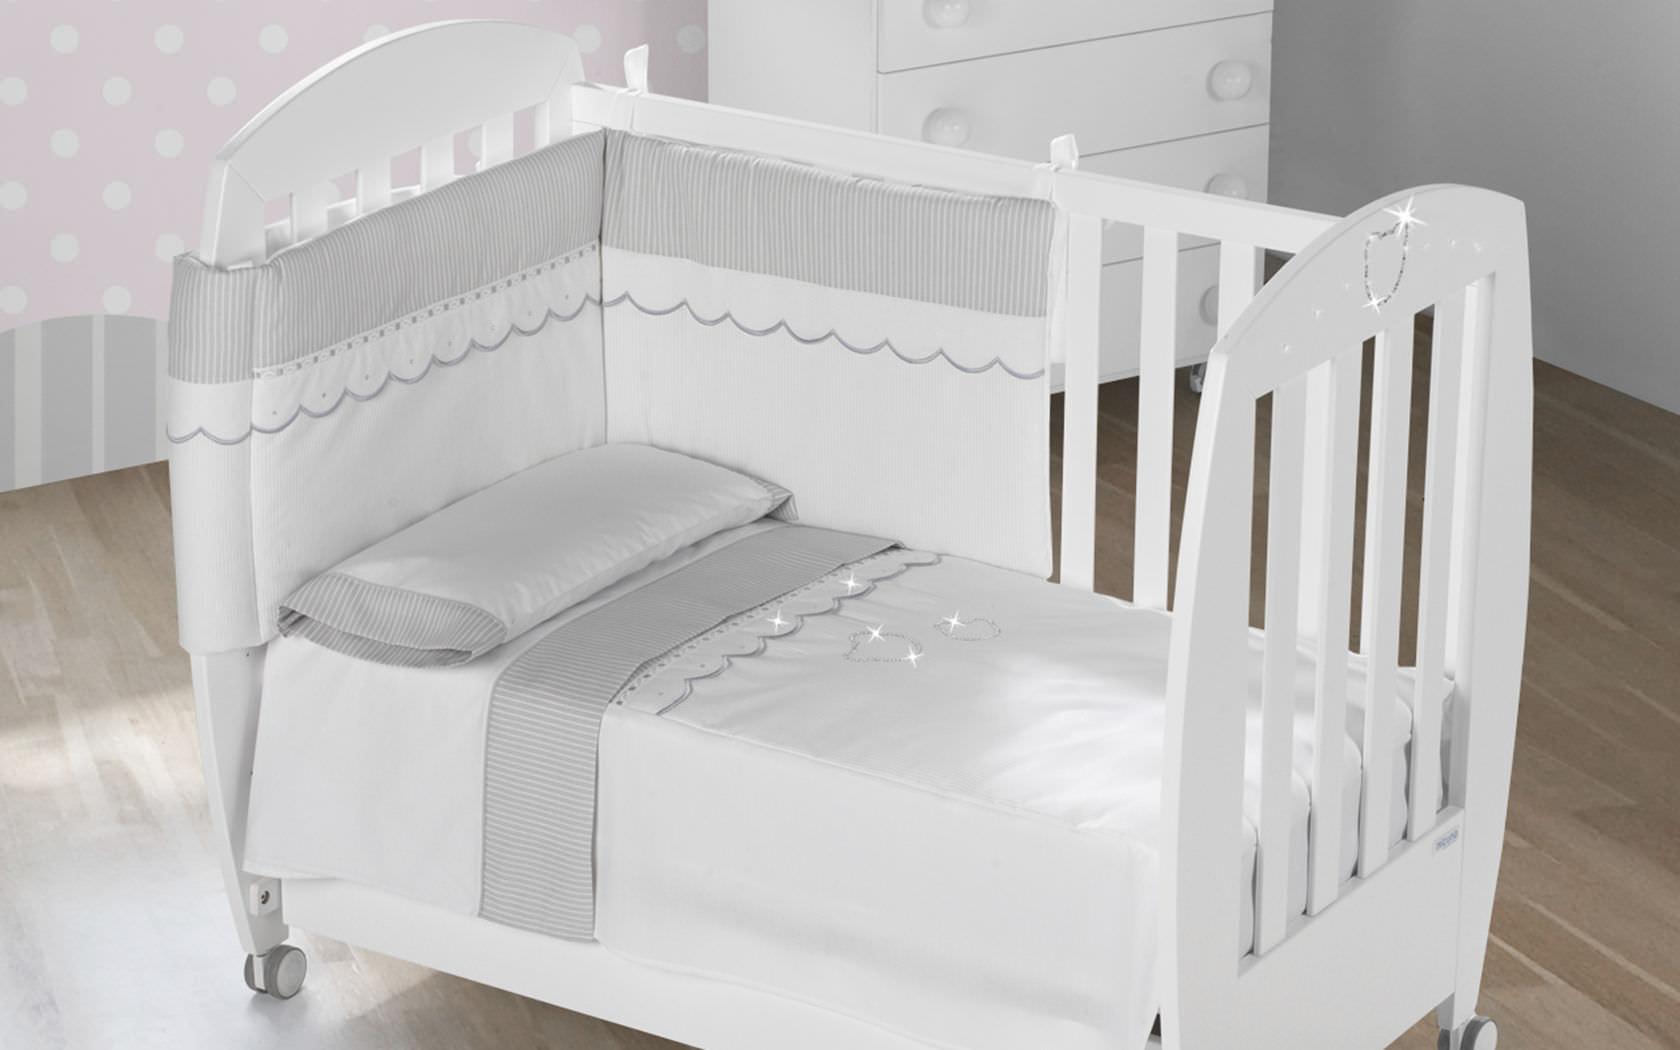 lit b b roulette ouistitipop. Black Bedroom Furniture Sets. Home Design Ideas